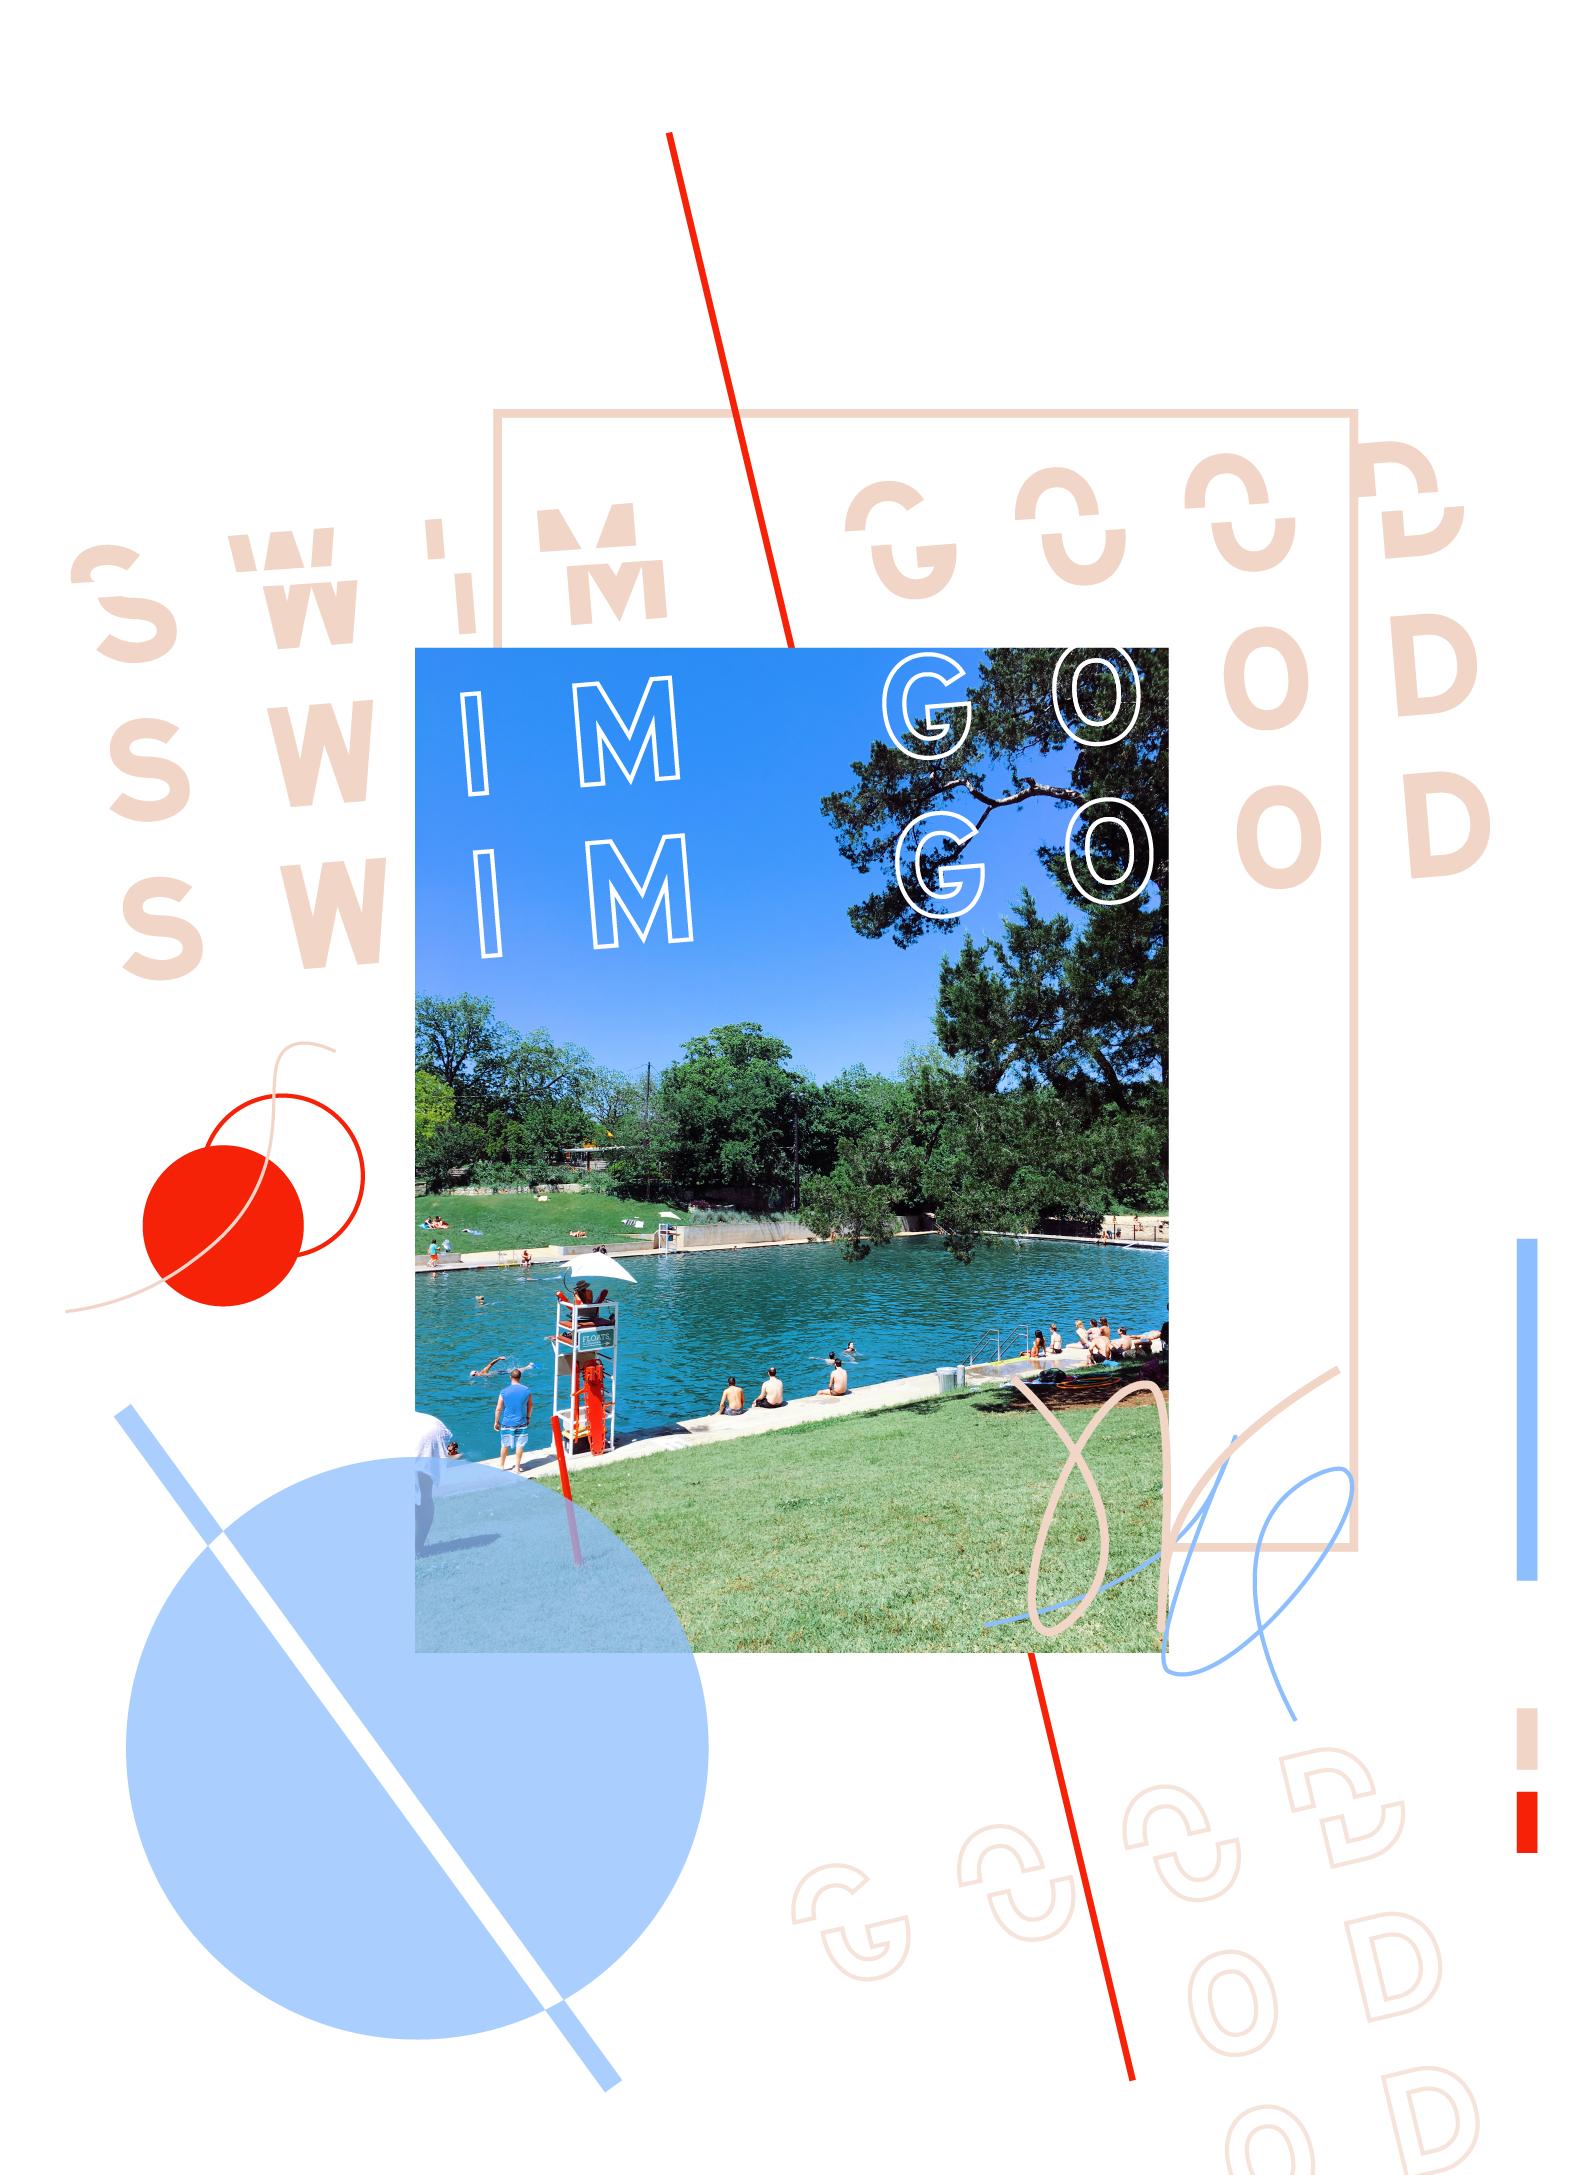 Swim Good - Darnell Lamont